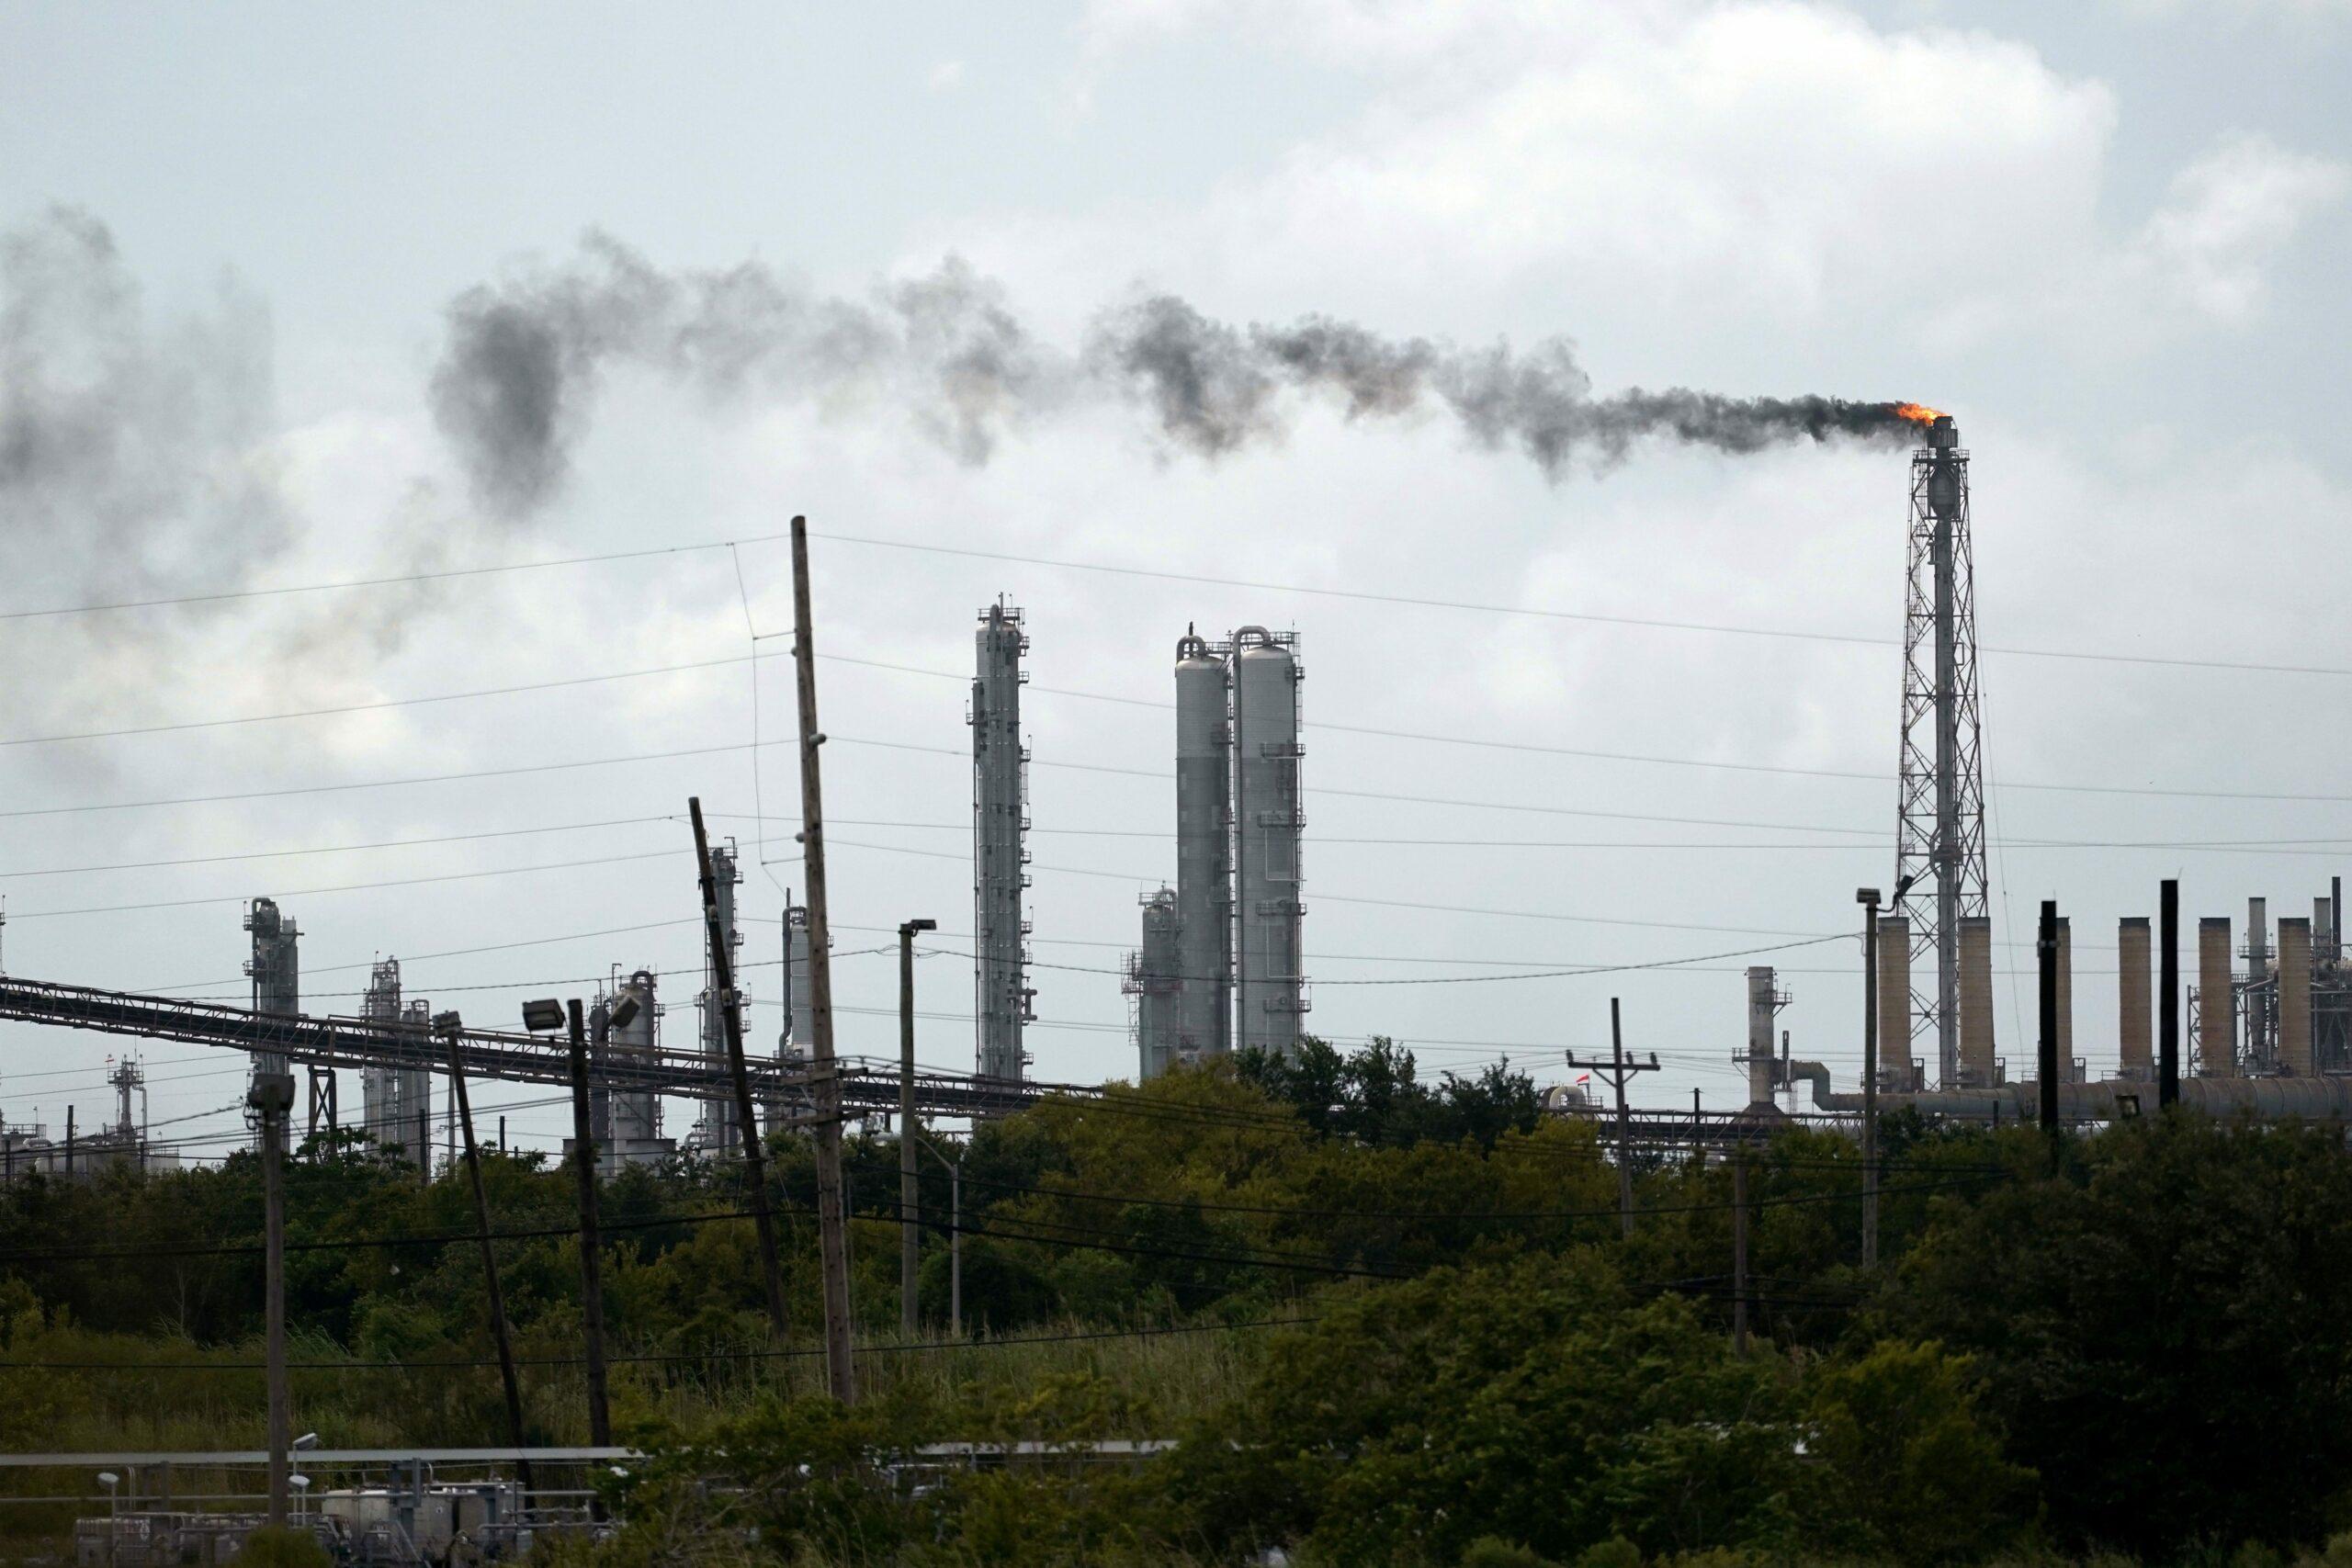 Oil and gasoline business assesses destruction at refineries, vegetation